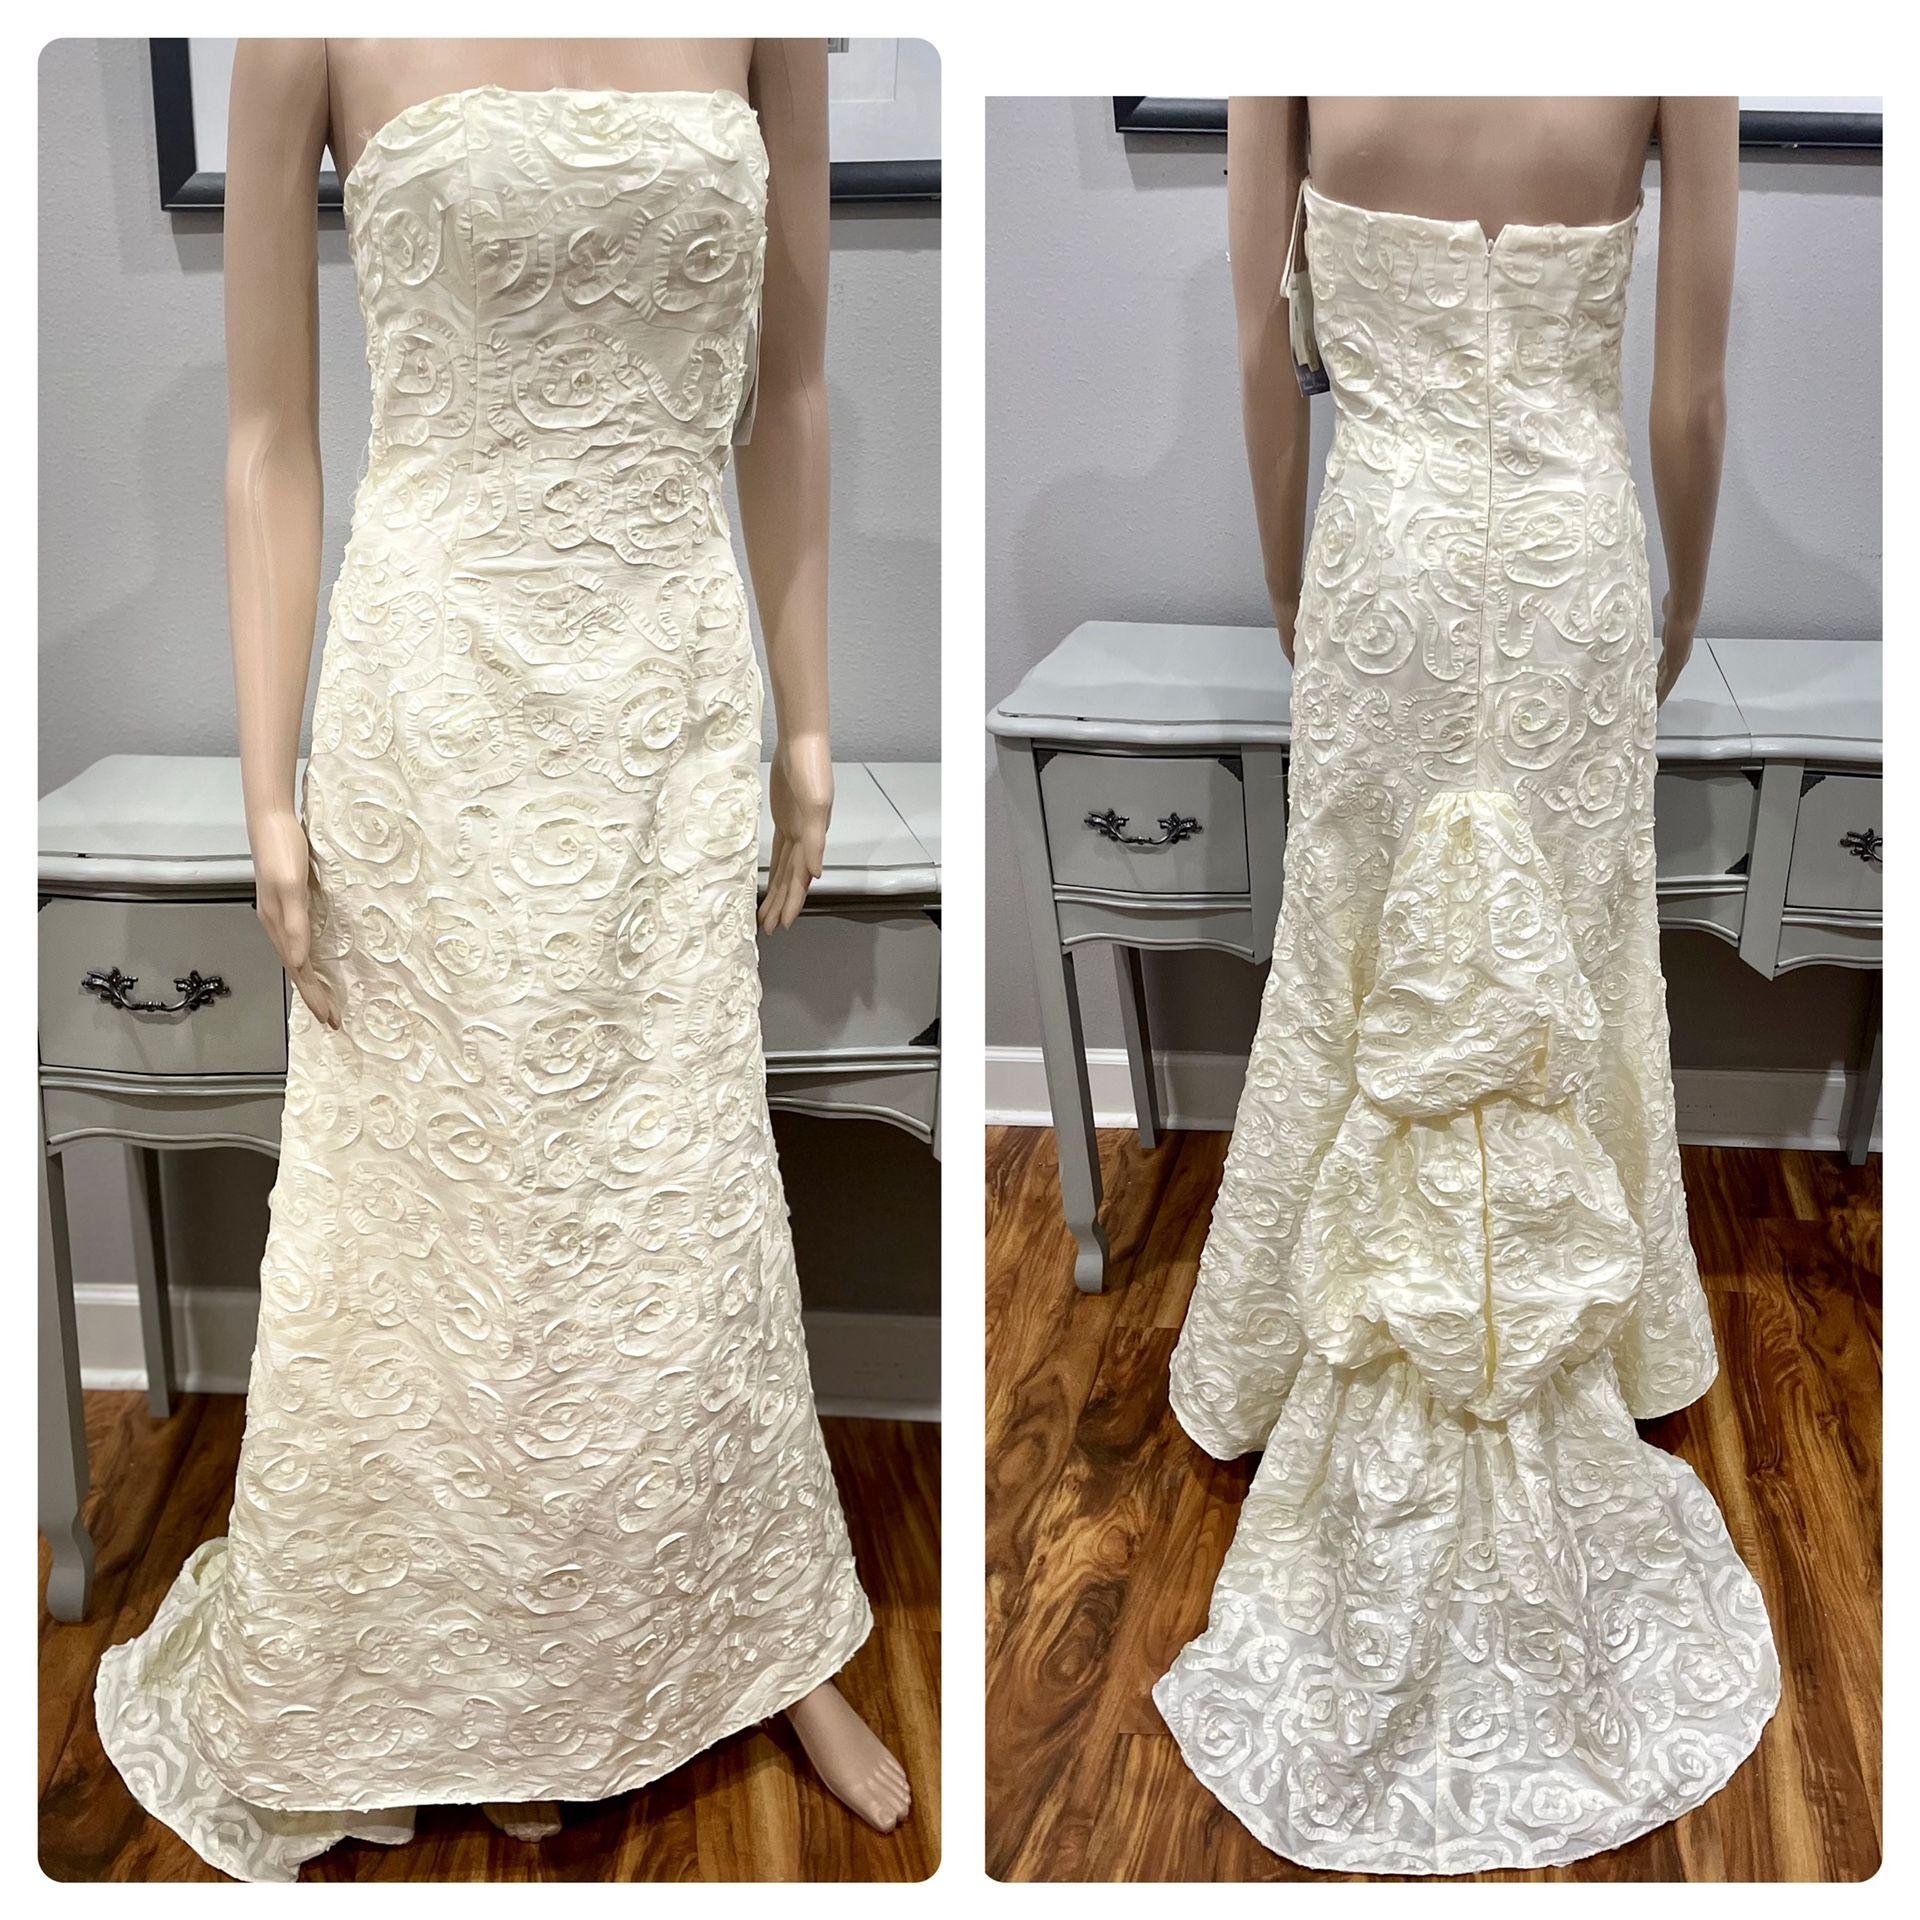 NWT Jessica McClintock Strapless Ribbon Appliqué wedding dress! Size 4